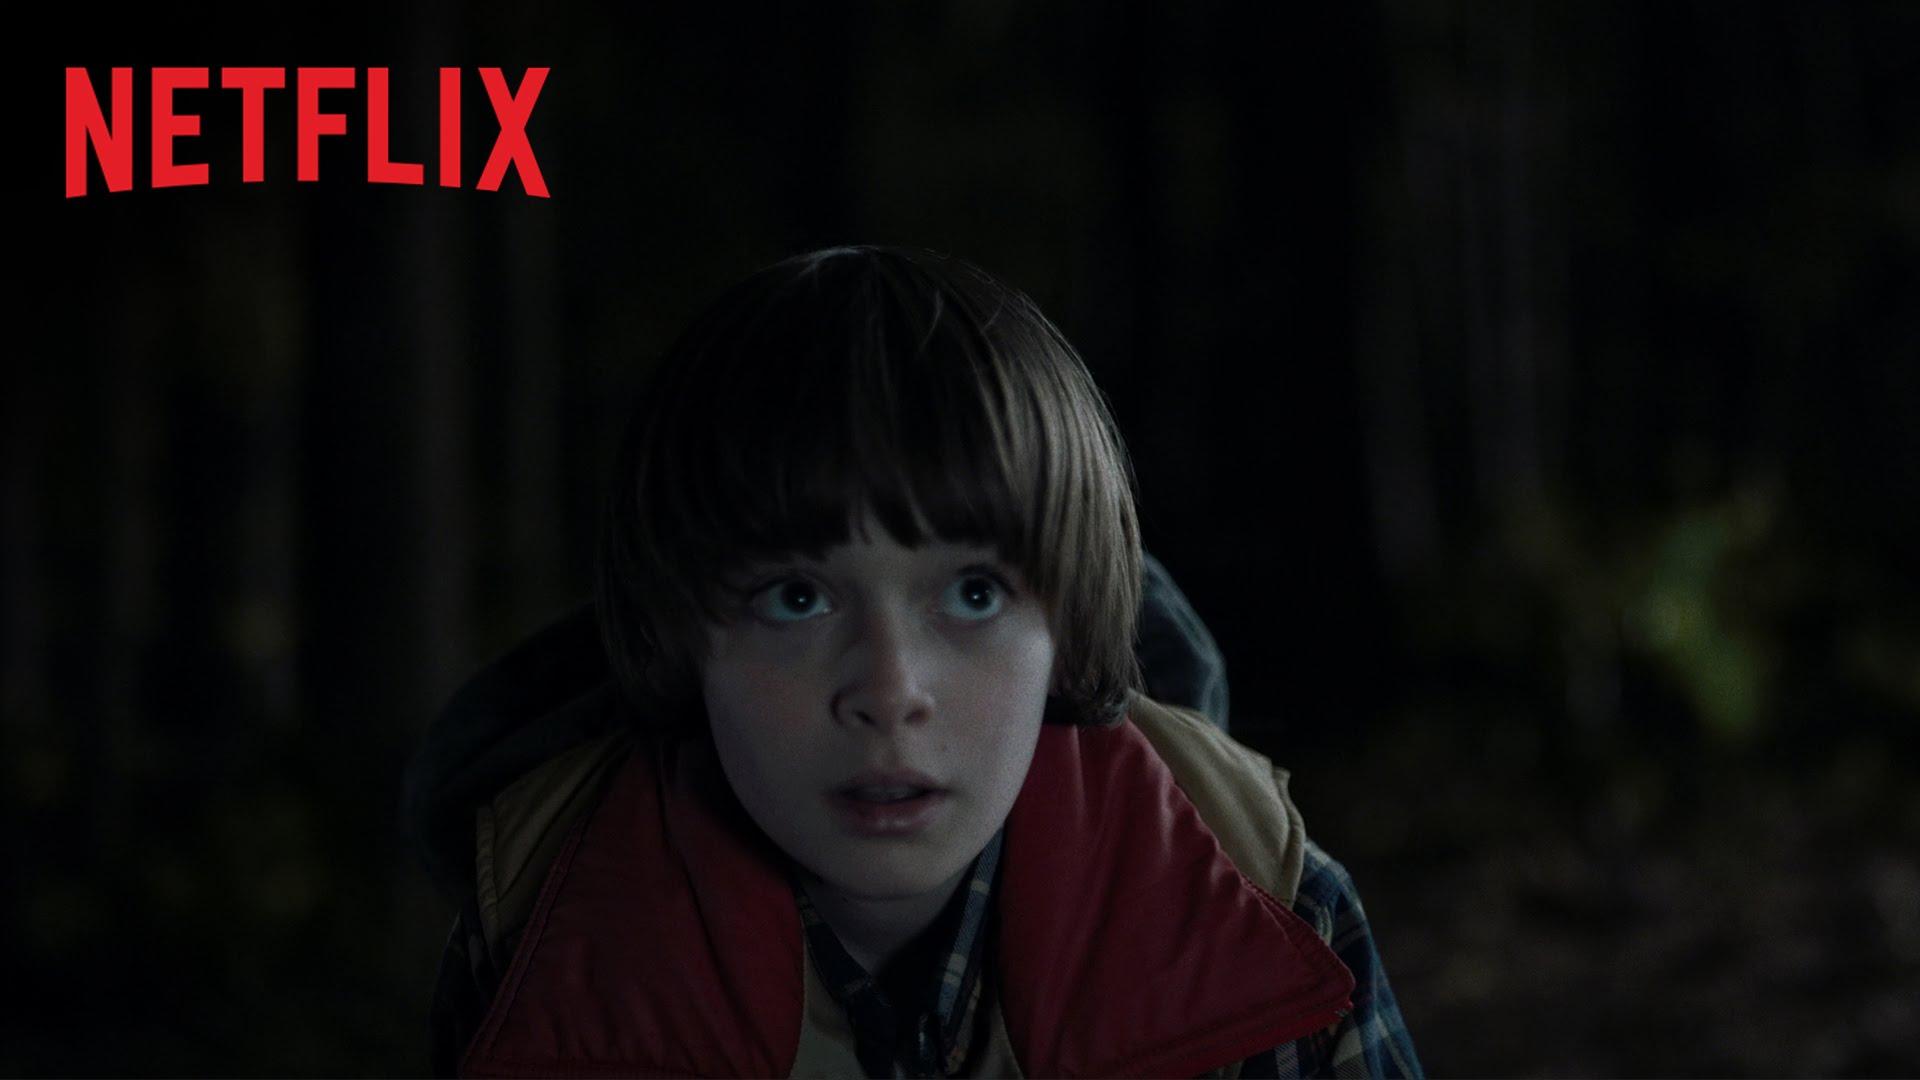 Stranger Things – La disparition de Will Byers – Netflix [HD]